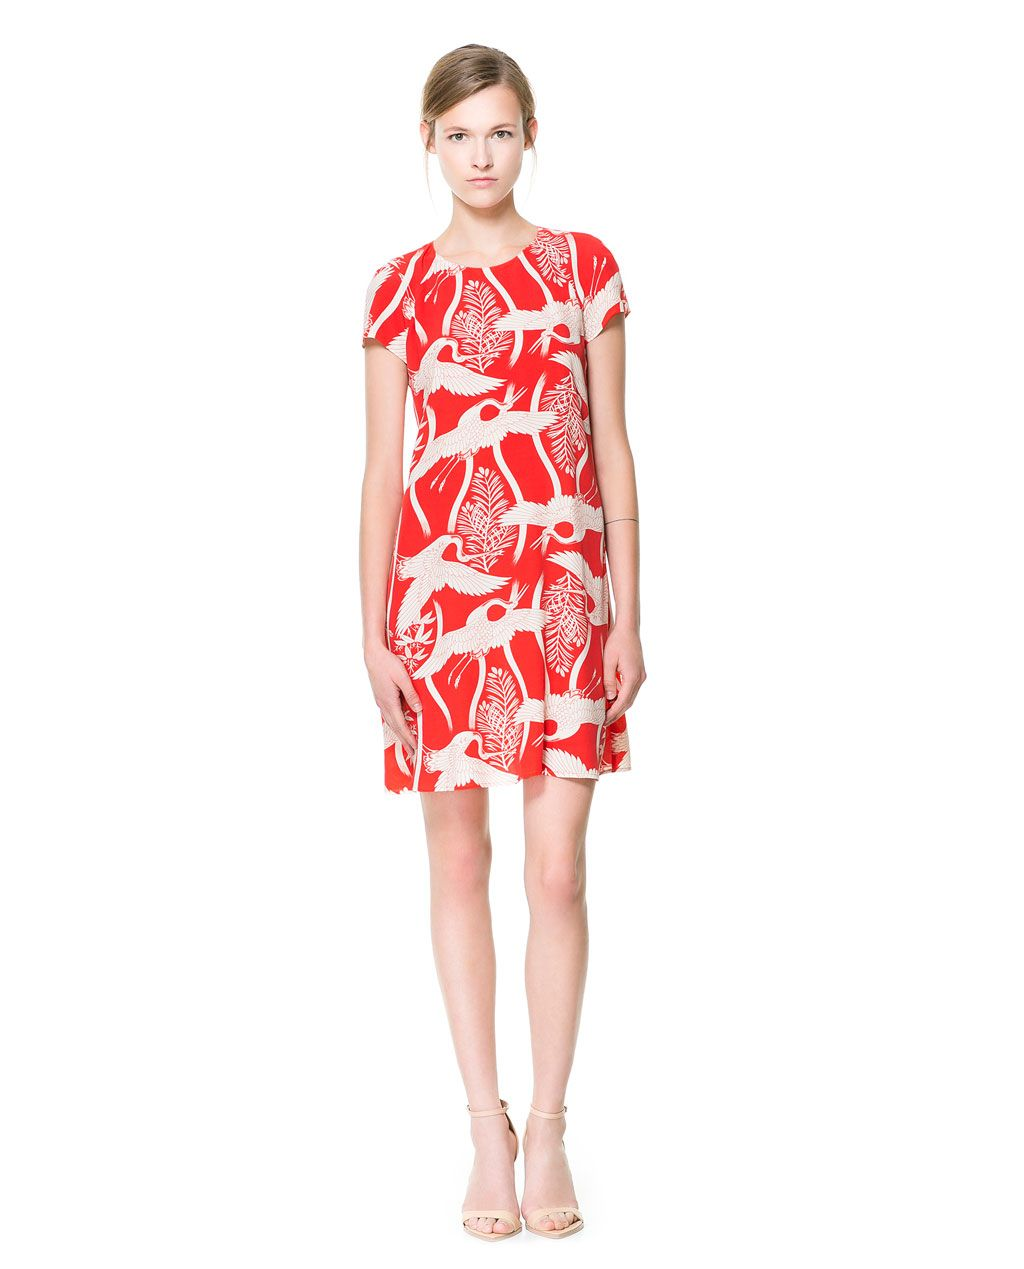 Image of bird print dress from zara stylish pinterest zara